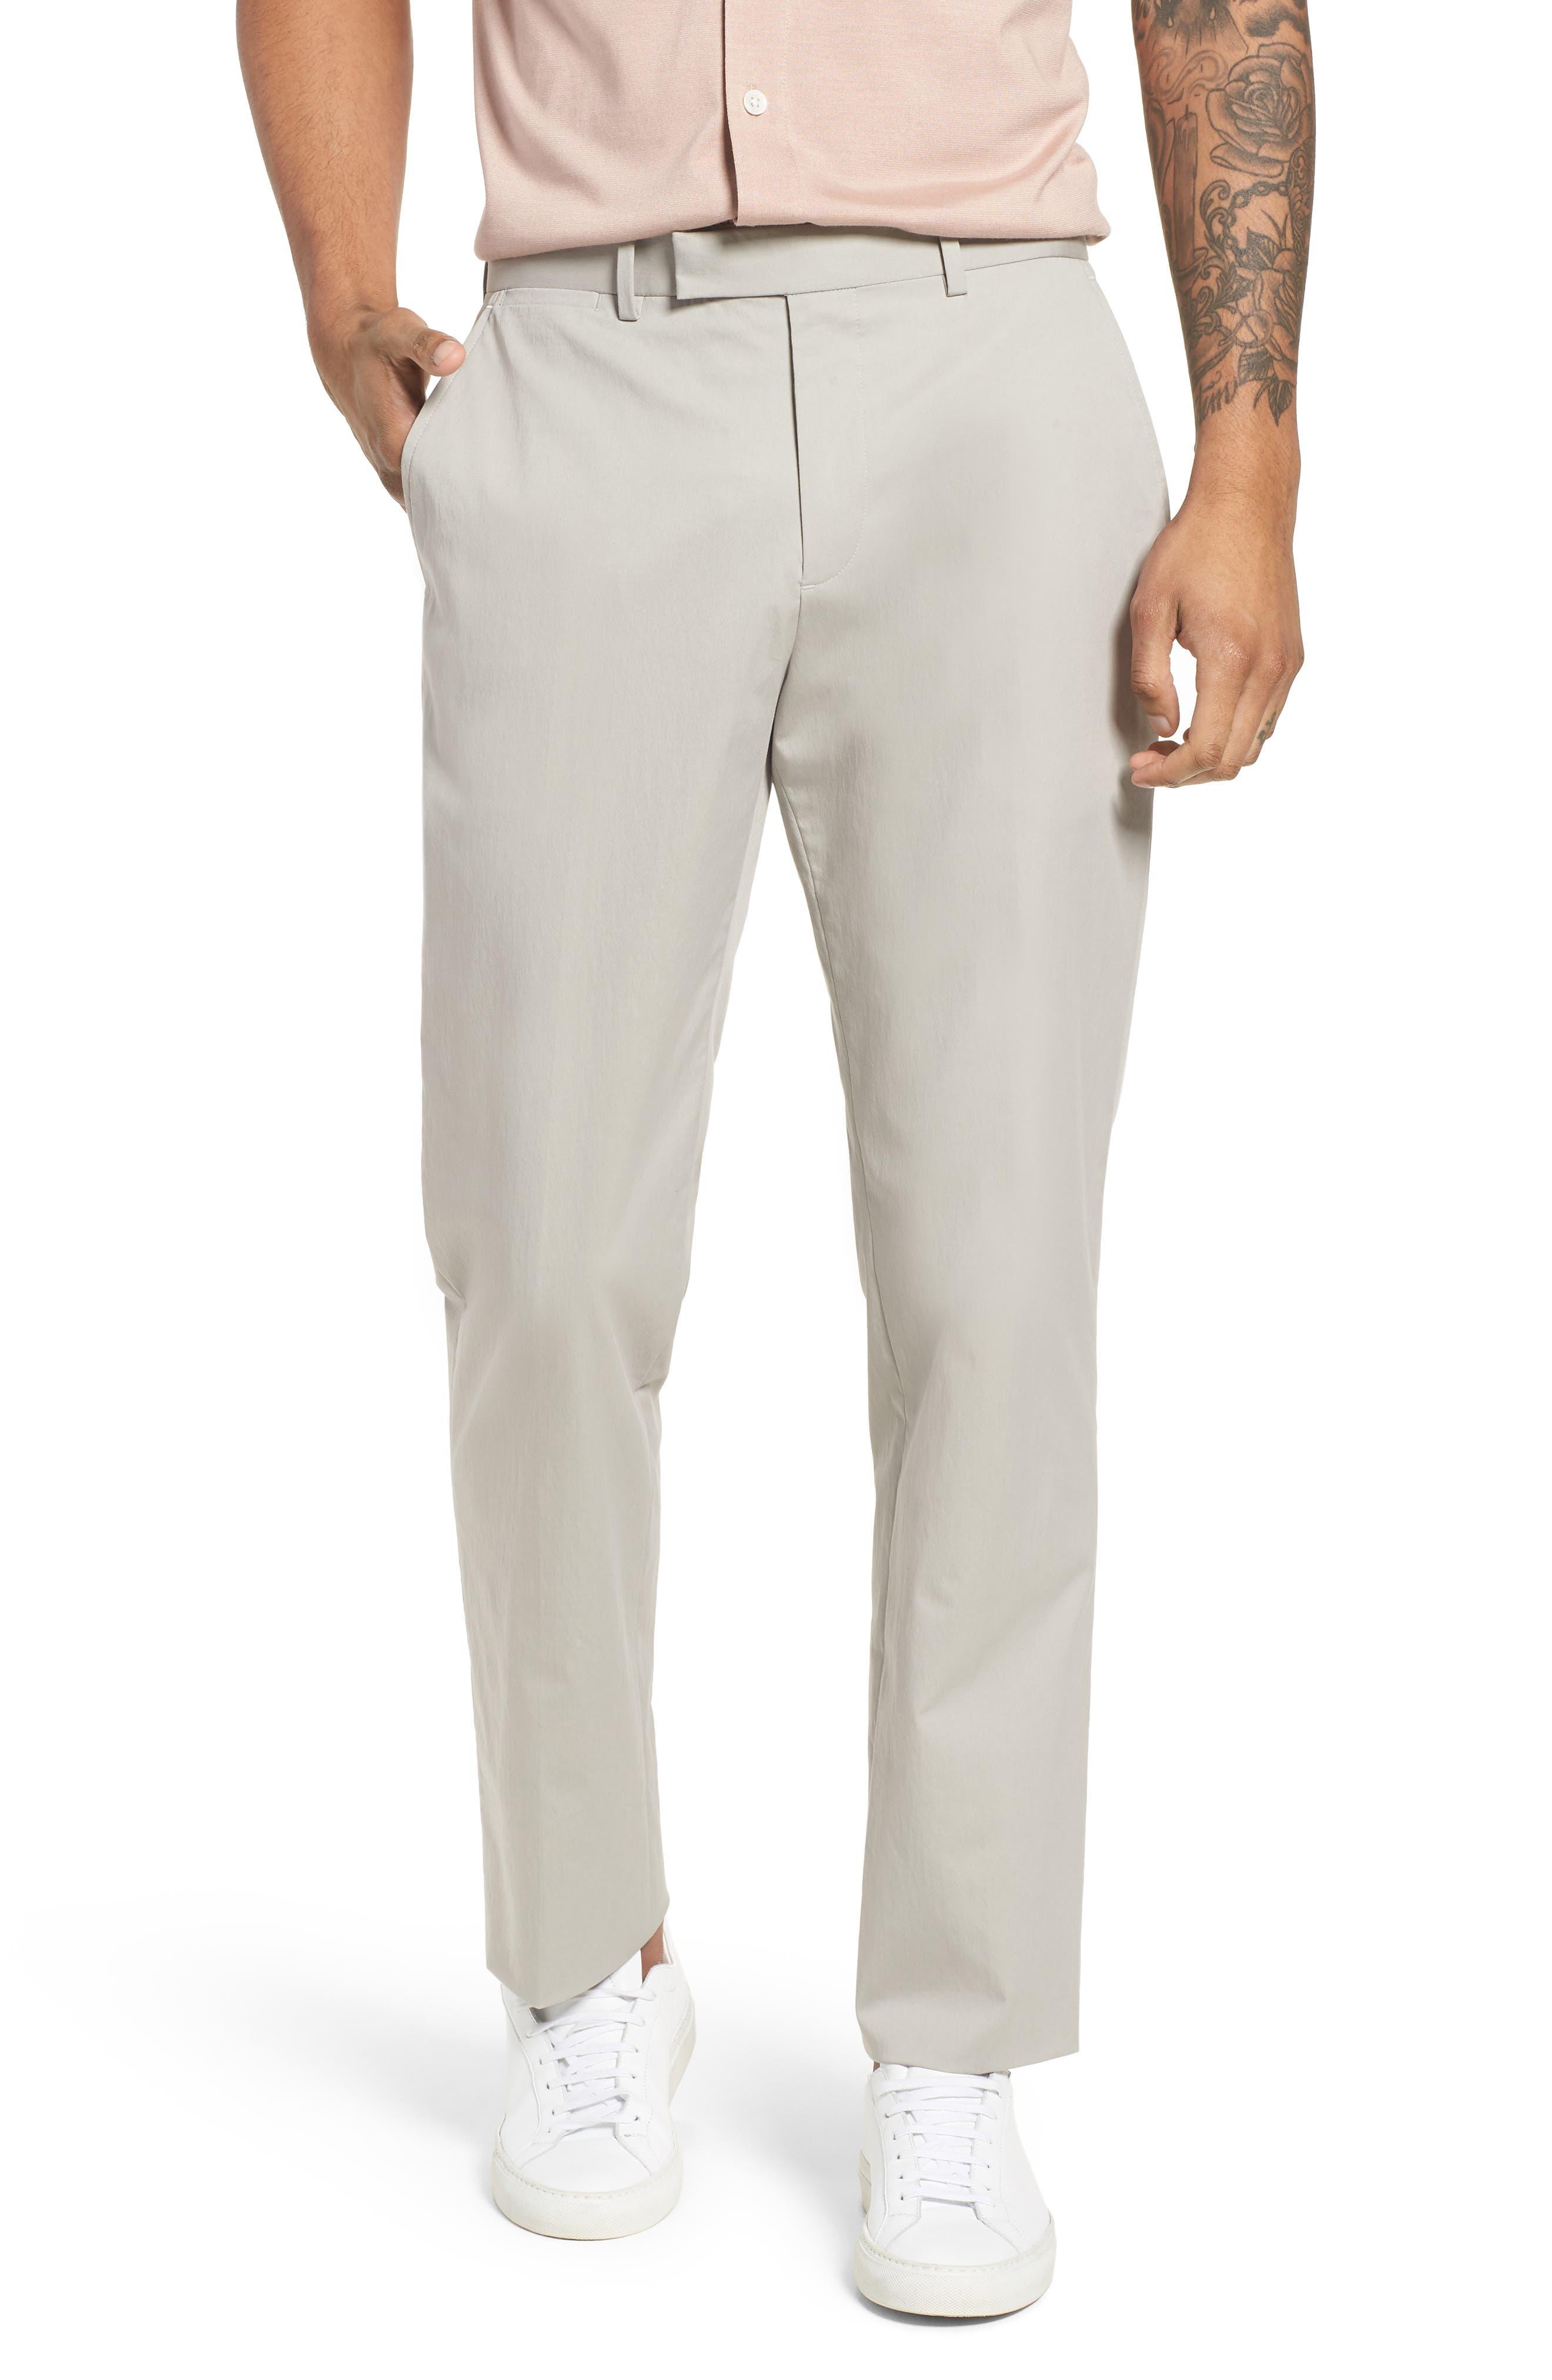 Zaine Technical Flat Front Stretch Pants,                         Main,                         color, Ash